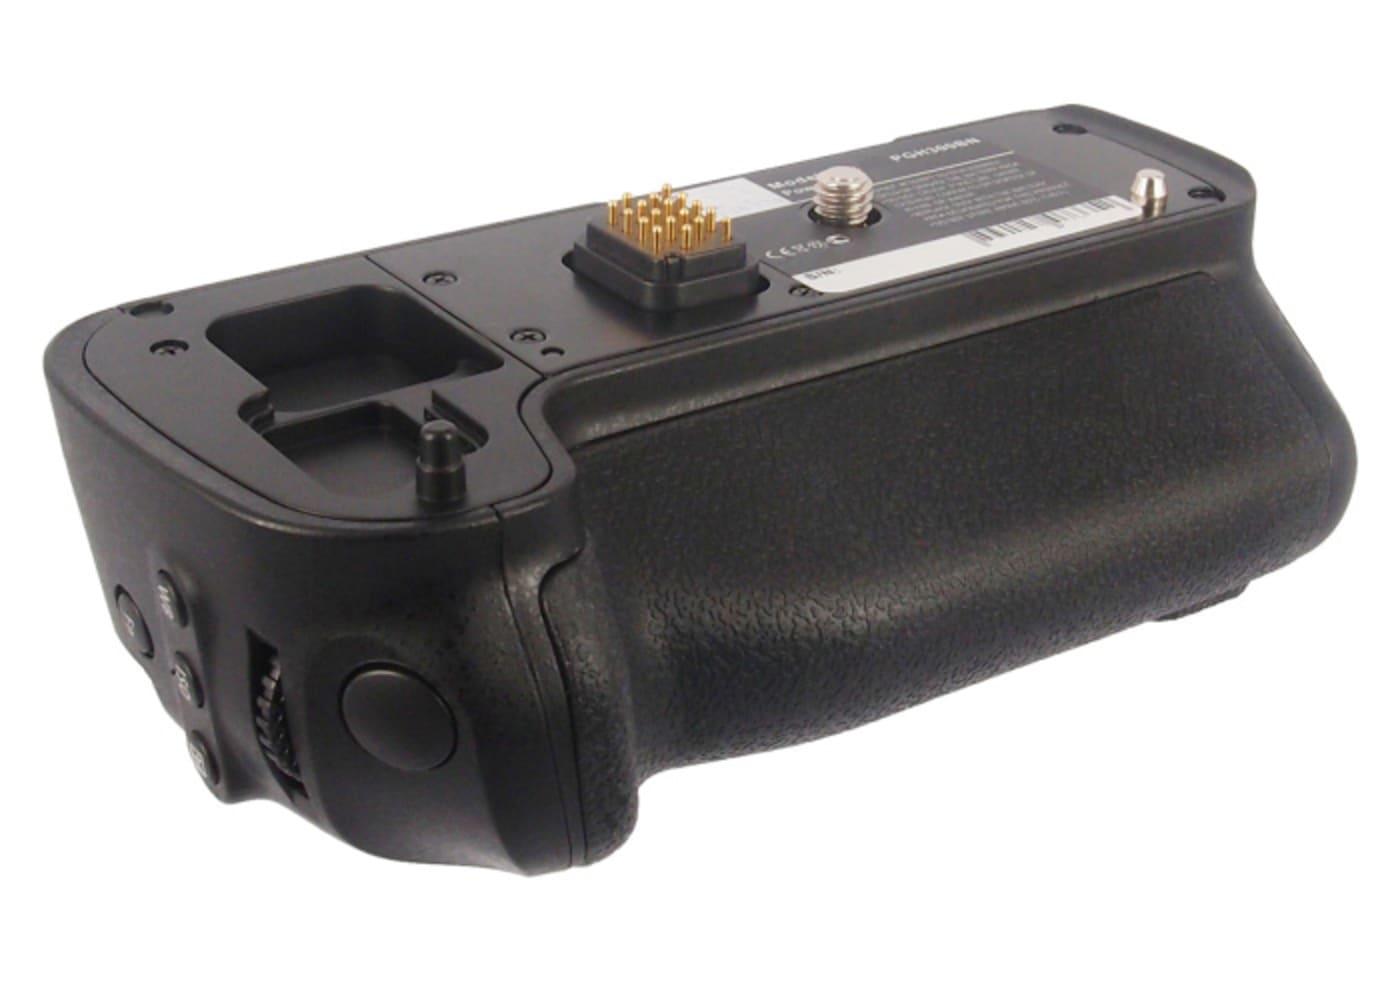 subtel® DMW-BGGH3 Battery Grip voor Panasonic Lumix DMC-GH3, DMC-GH3A, DMC-GH3H, DMC-GH4, DMC-GH4A Multifunctionele hendel, batterij greep